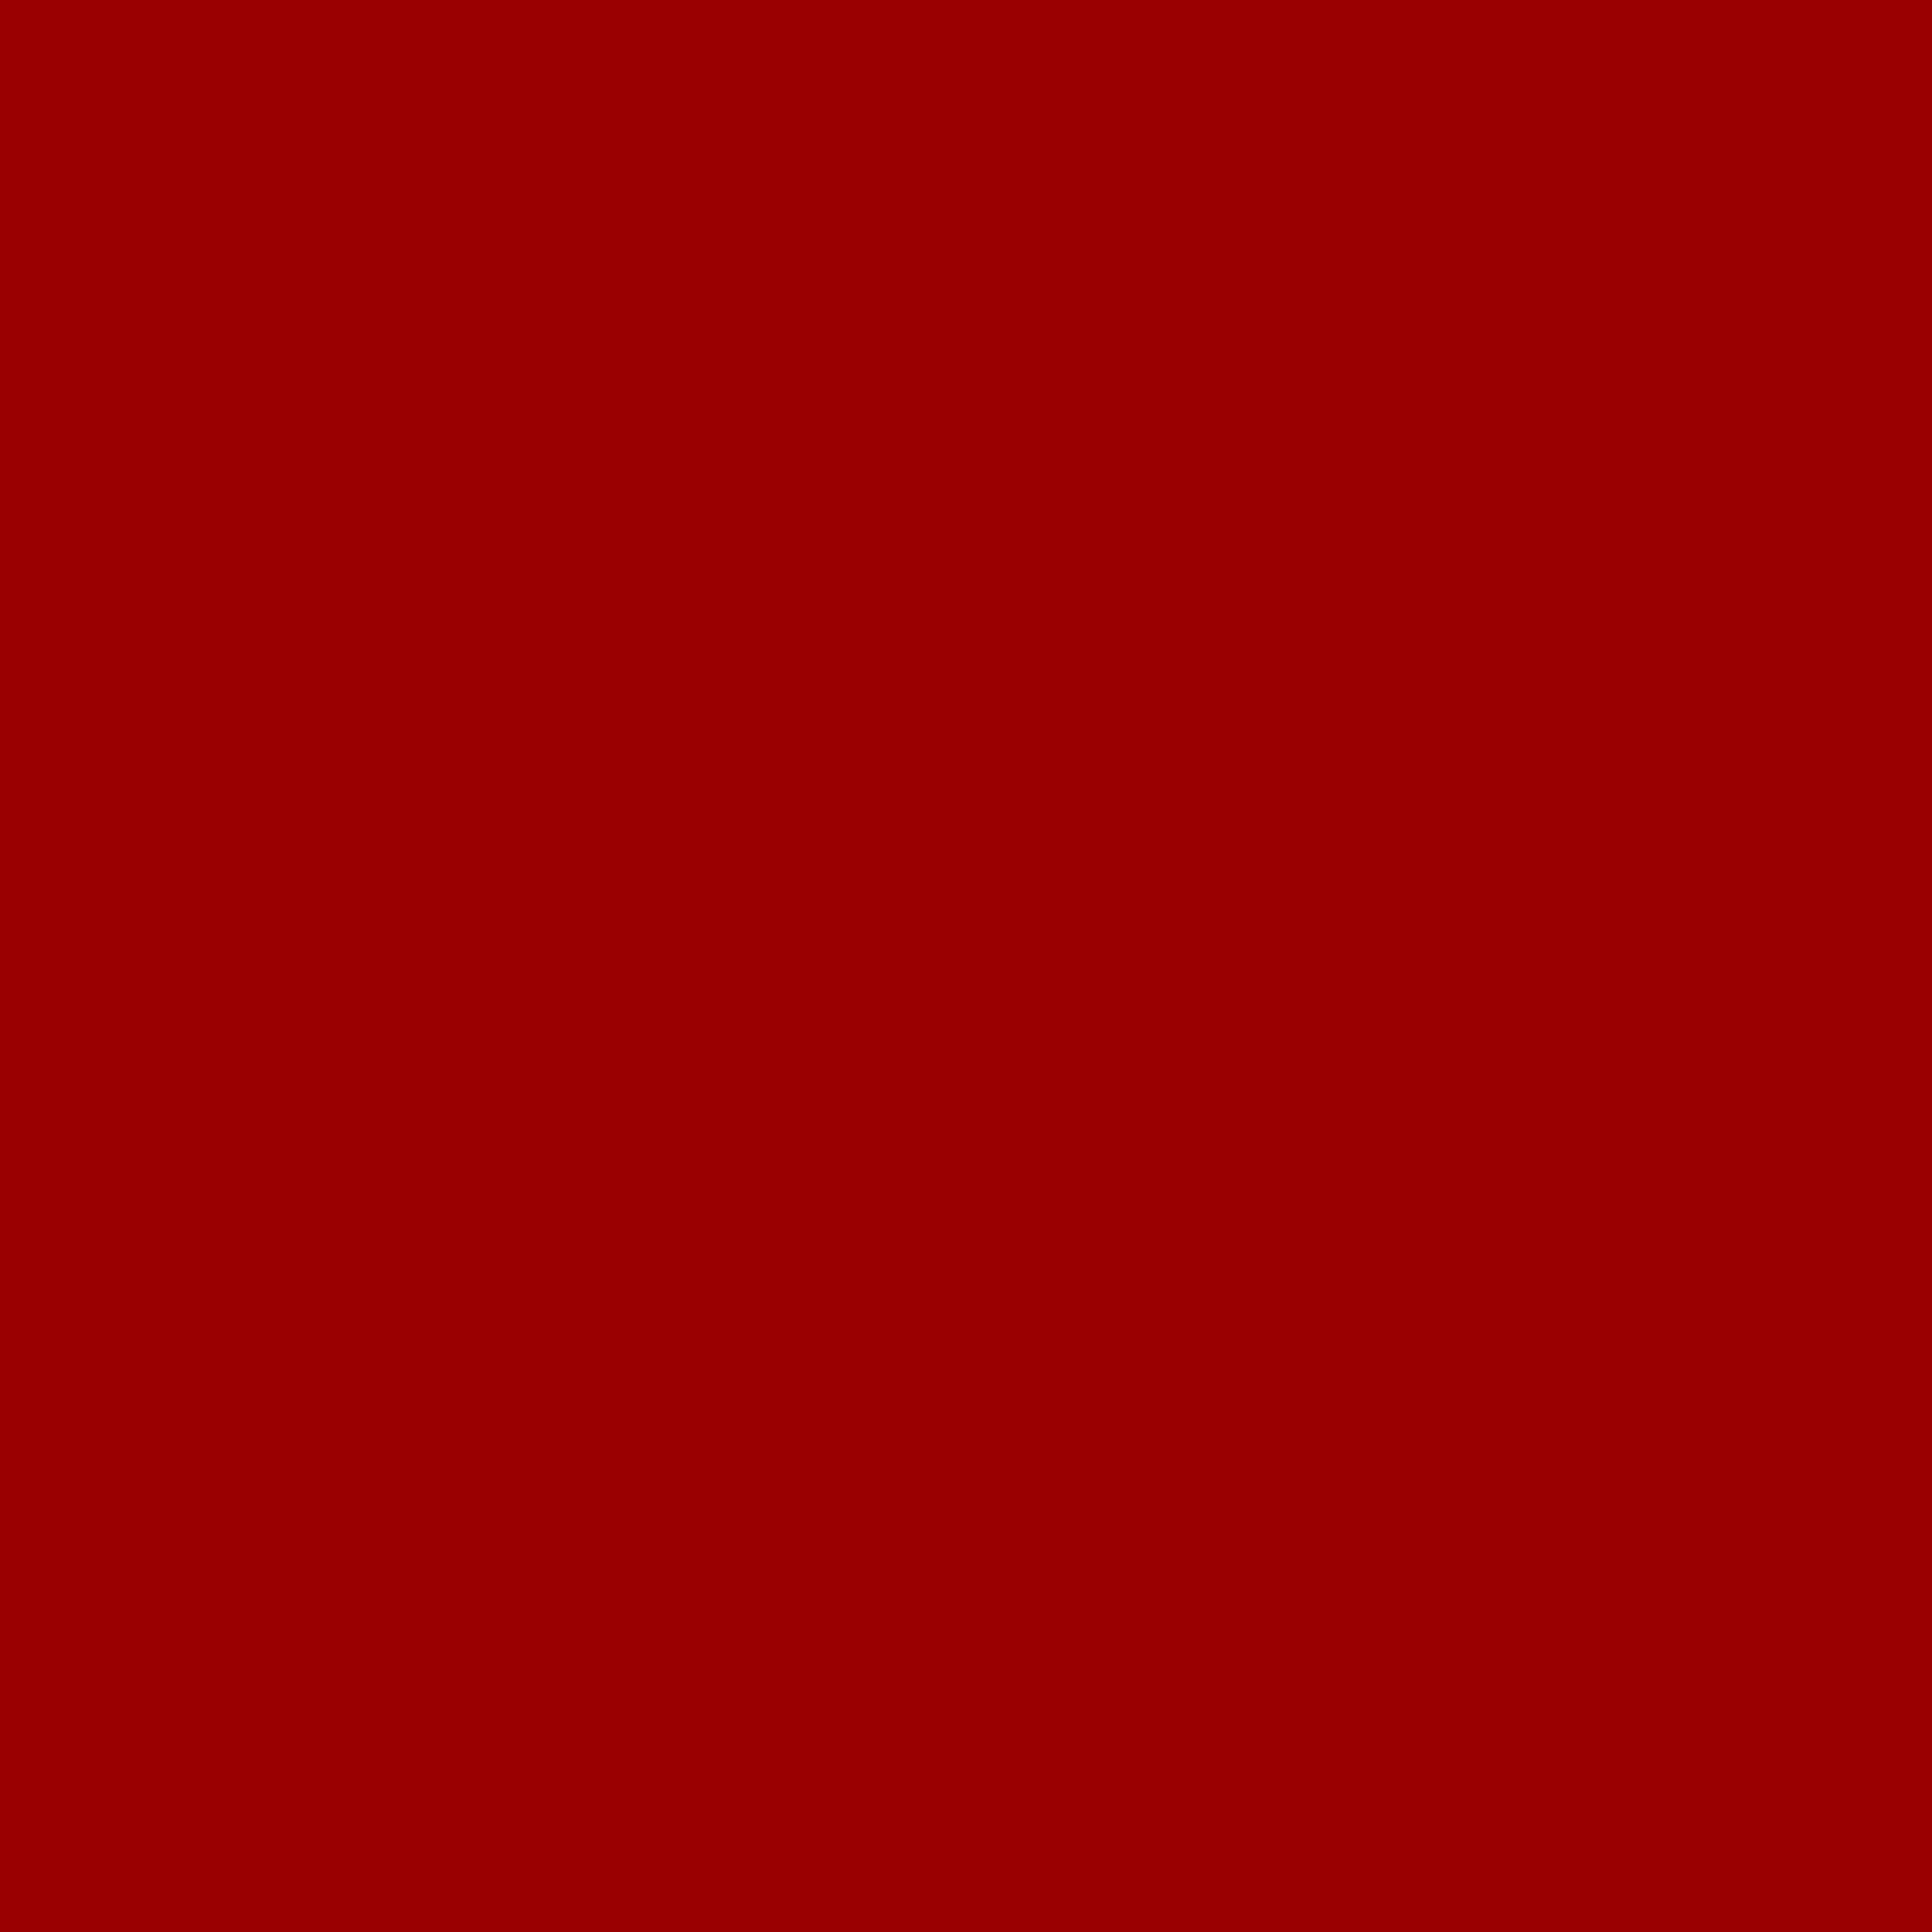 3600x3600 Stizza Solid Color Background